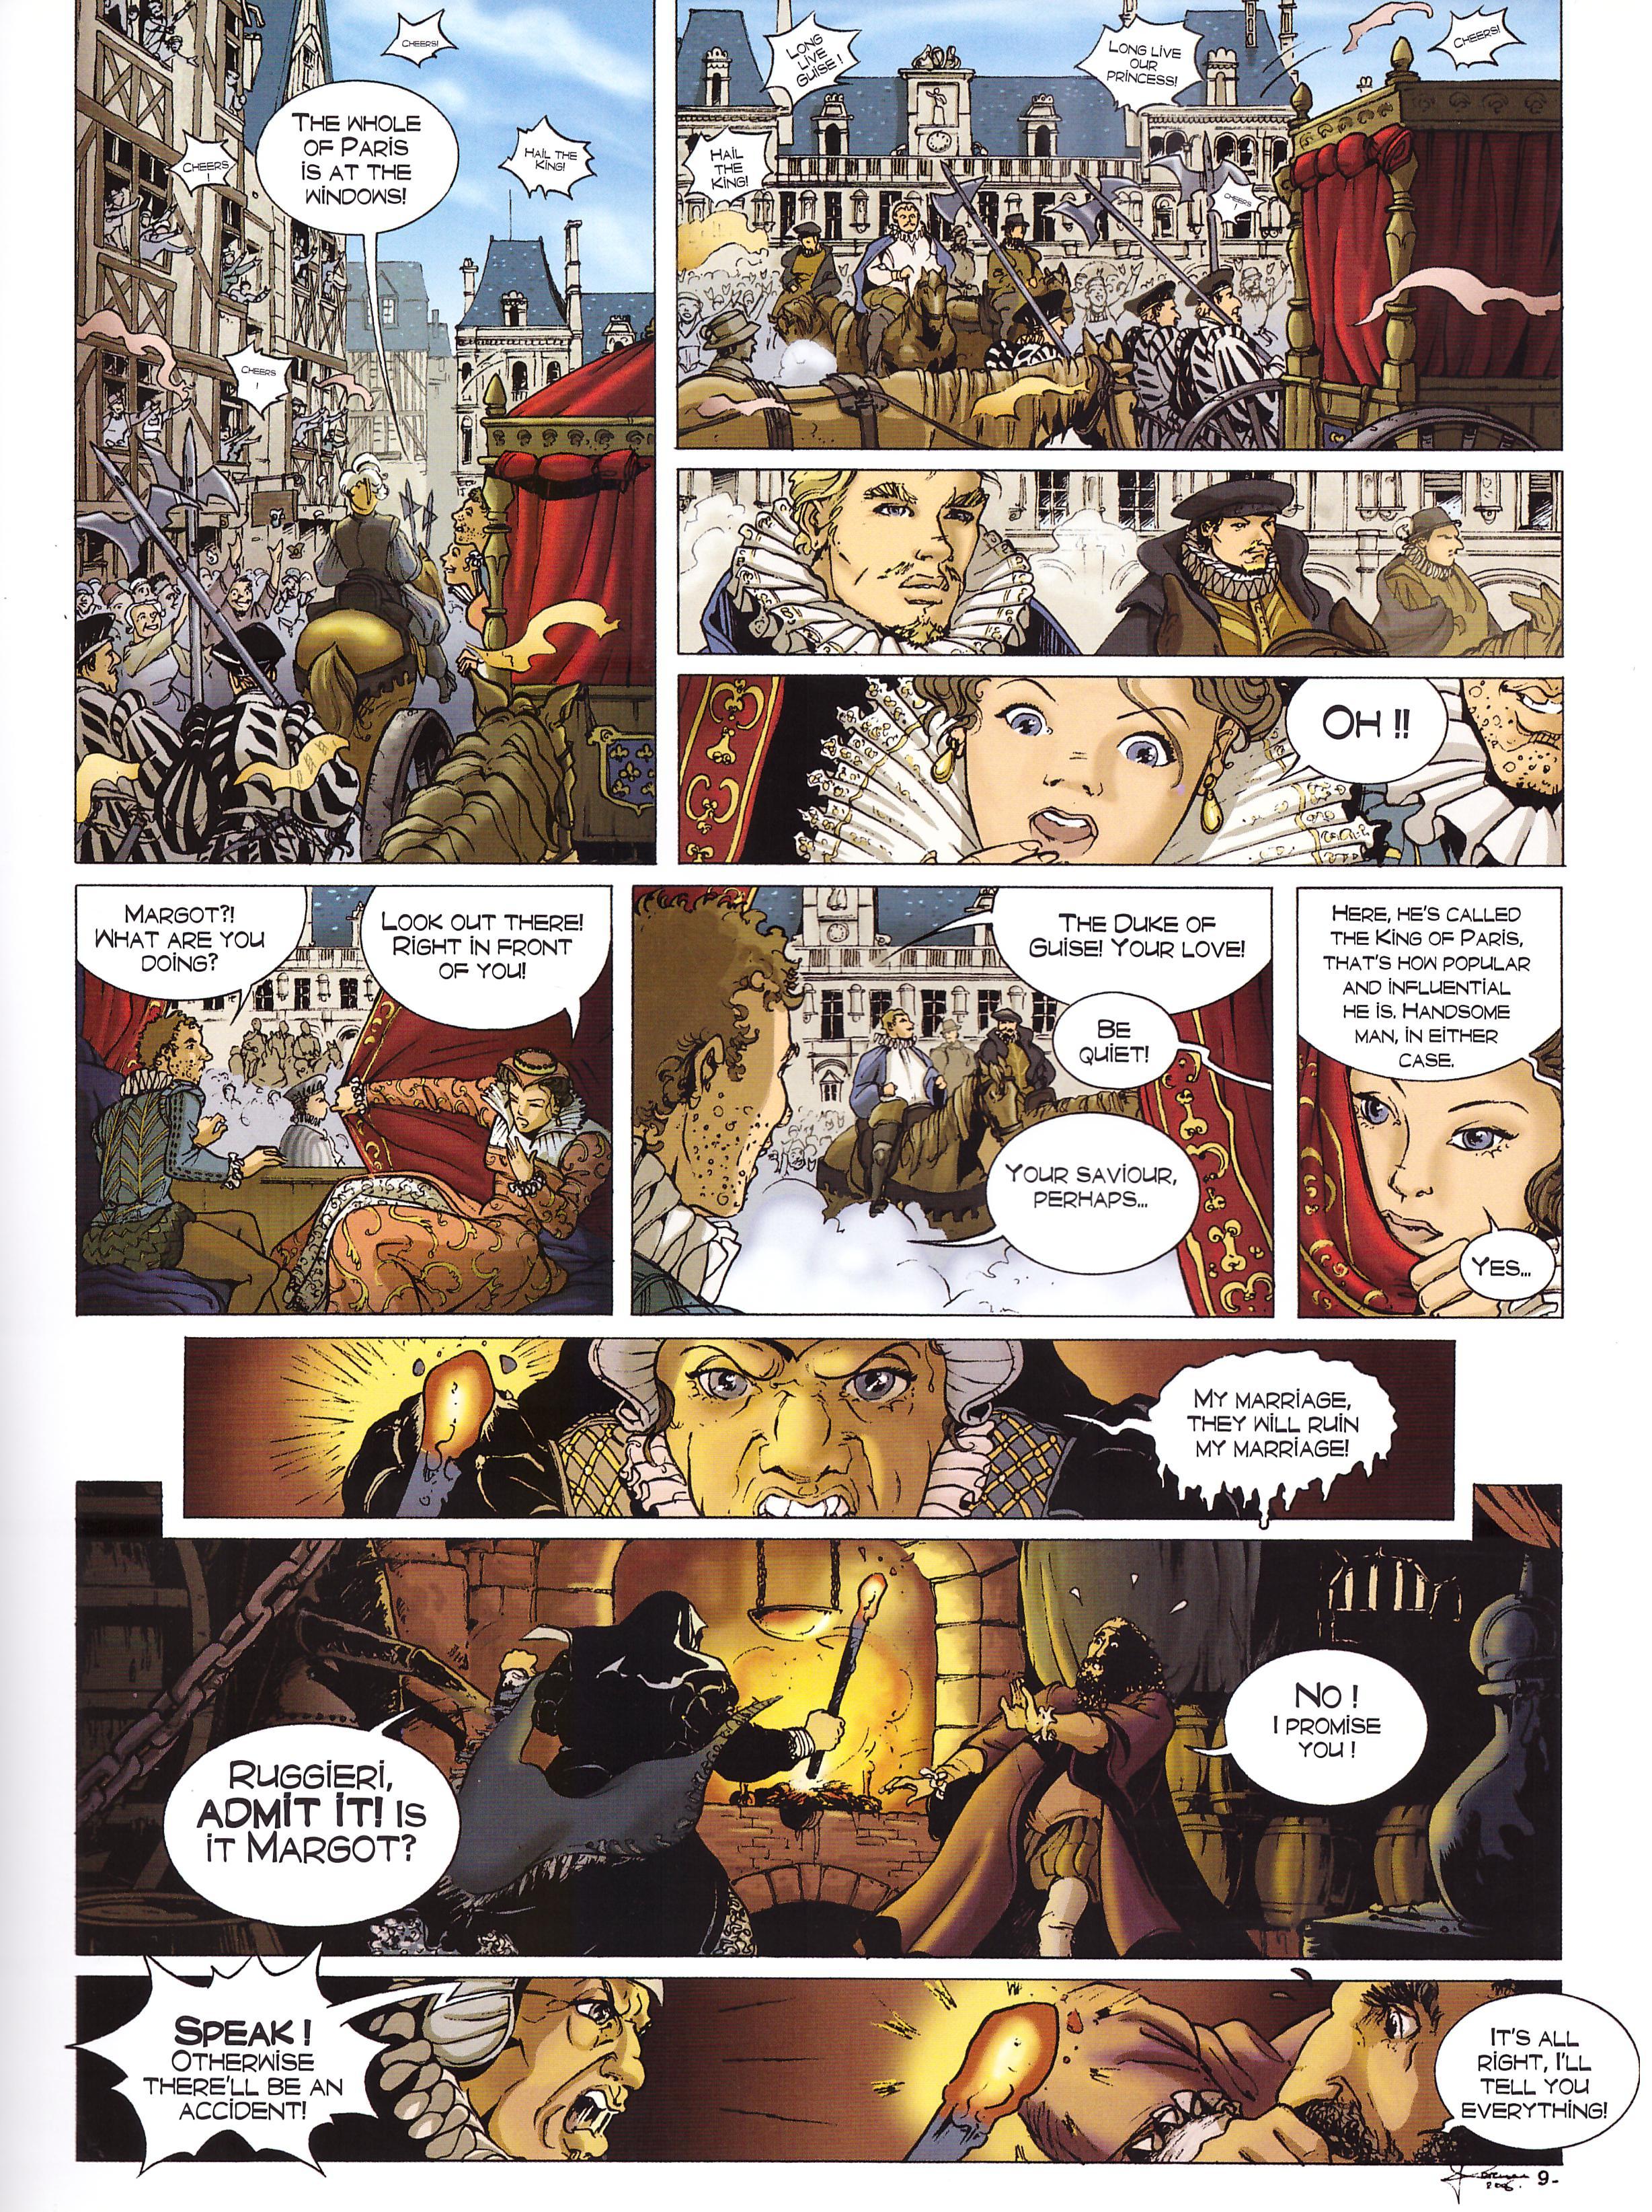 Queen Margot 2 The Bloody Wedding review